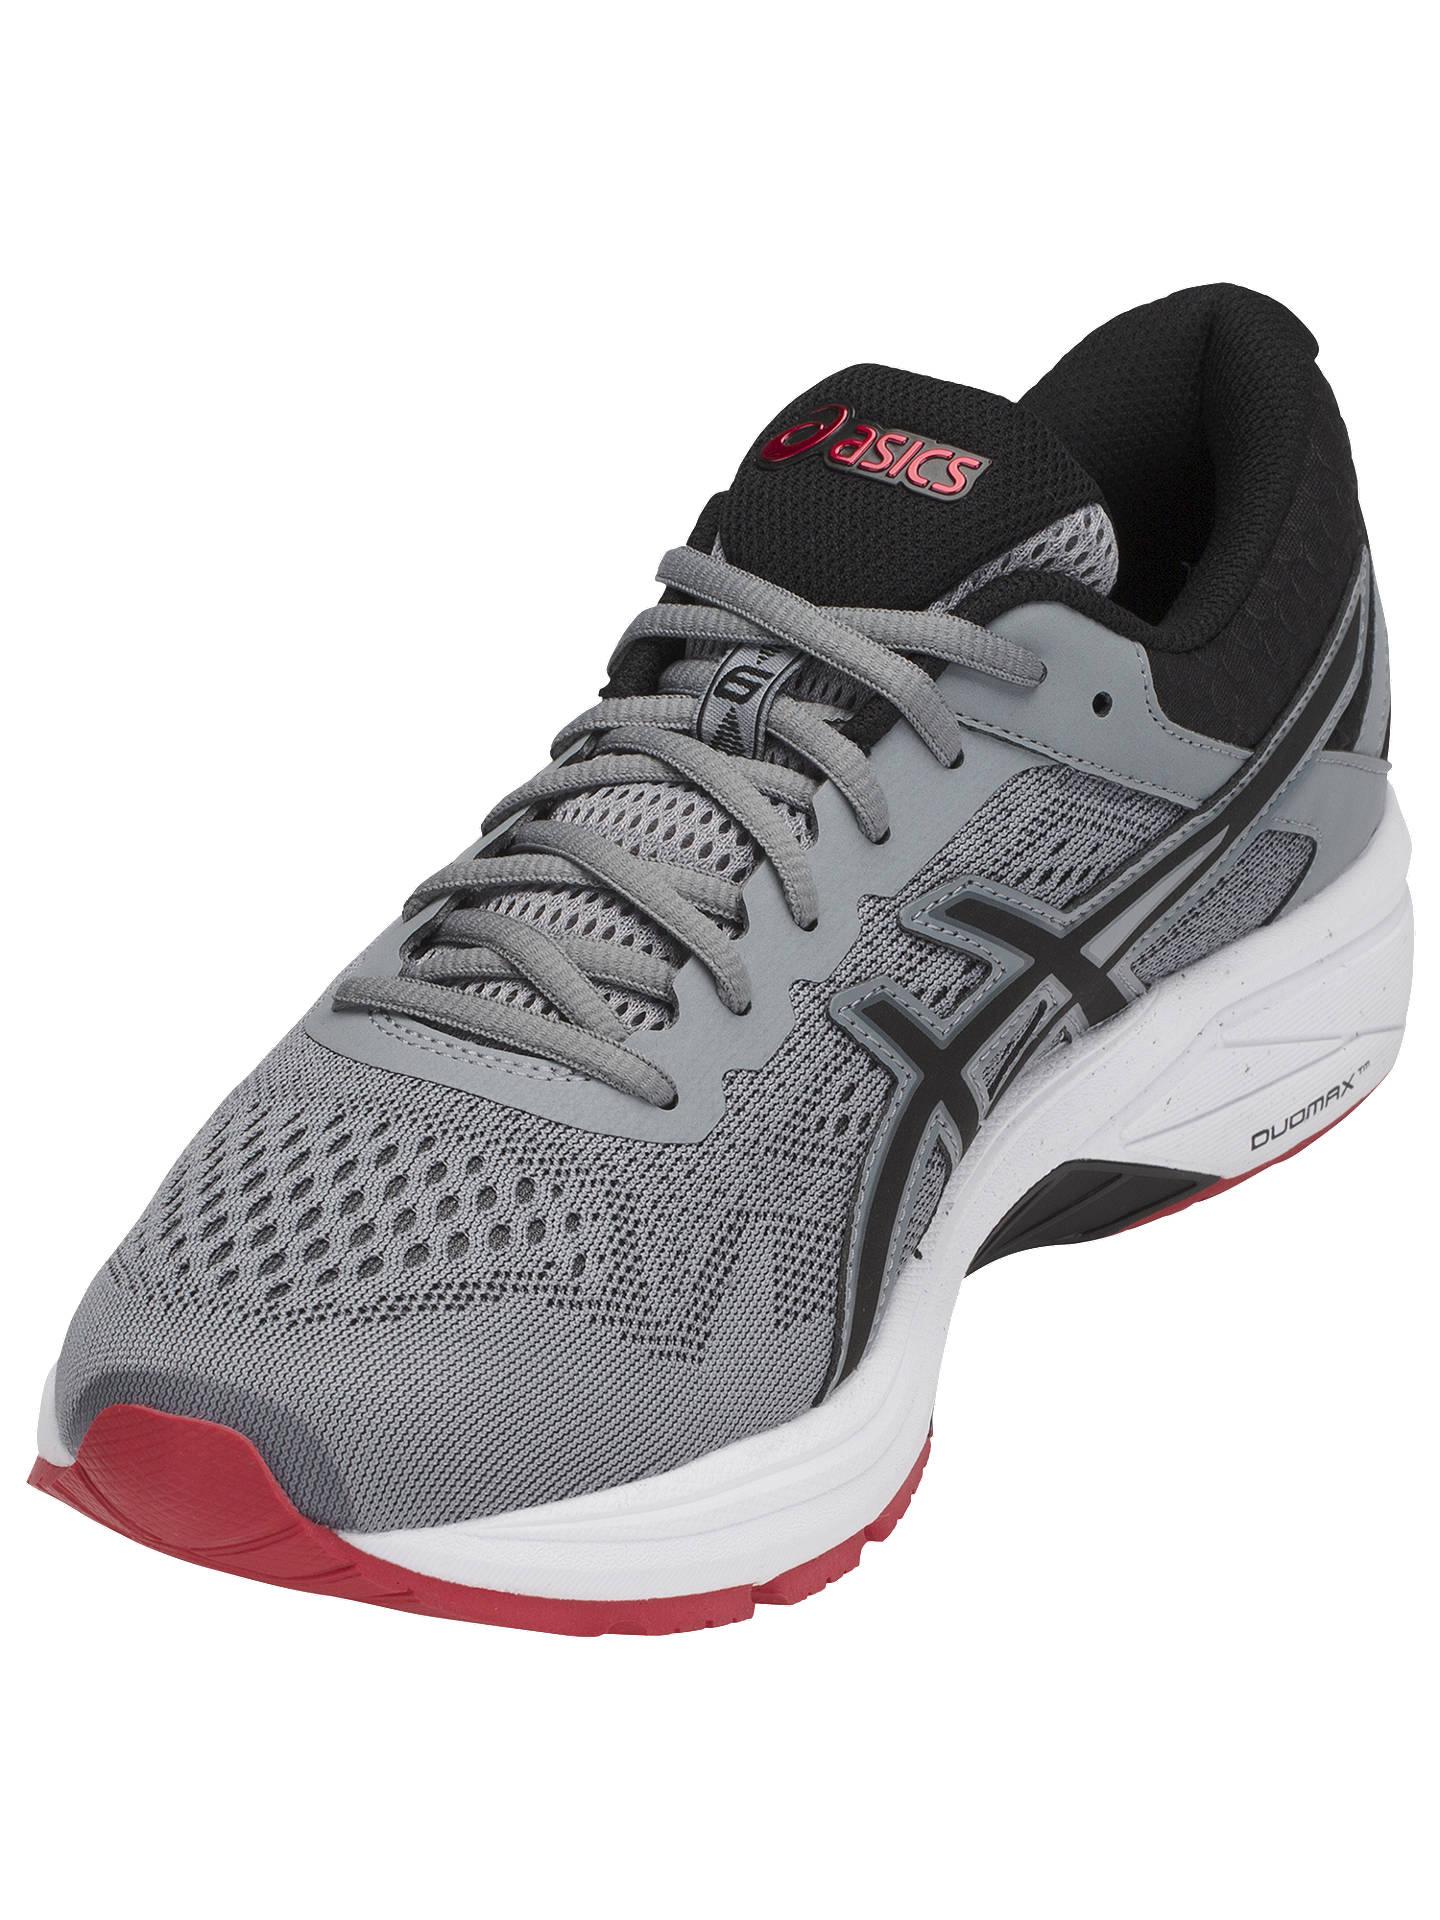 Asics GT-1000 6 Men s Running Shoes at John Lewis   Partners 23fb41ff79